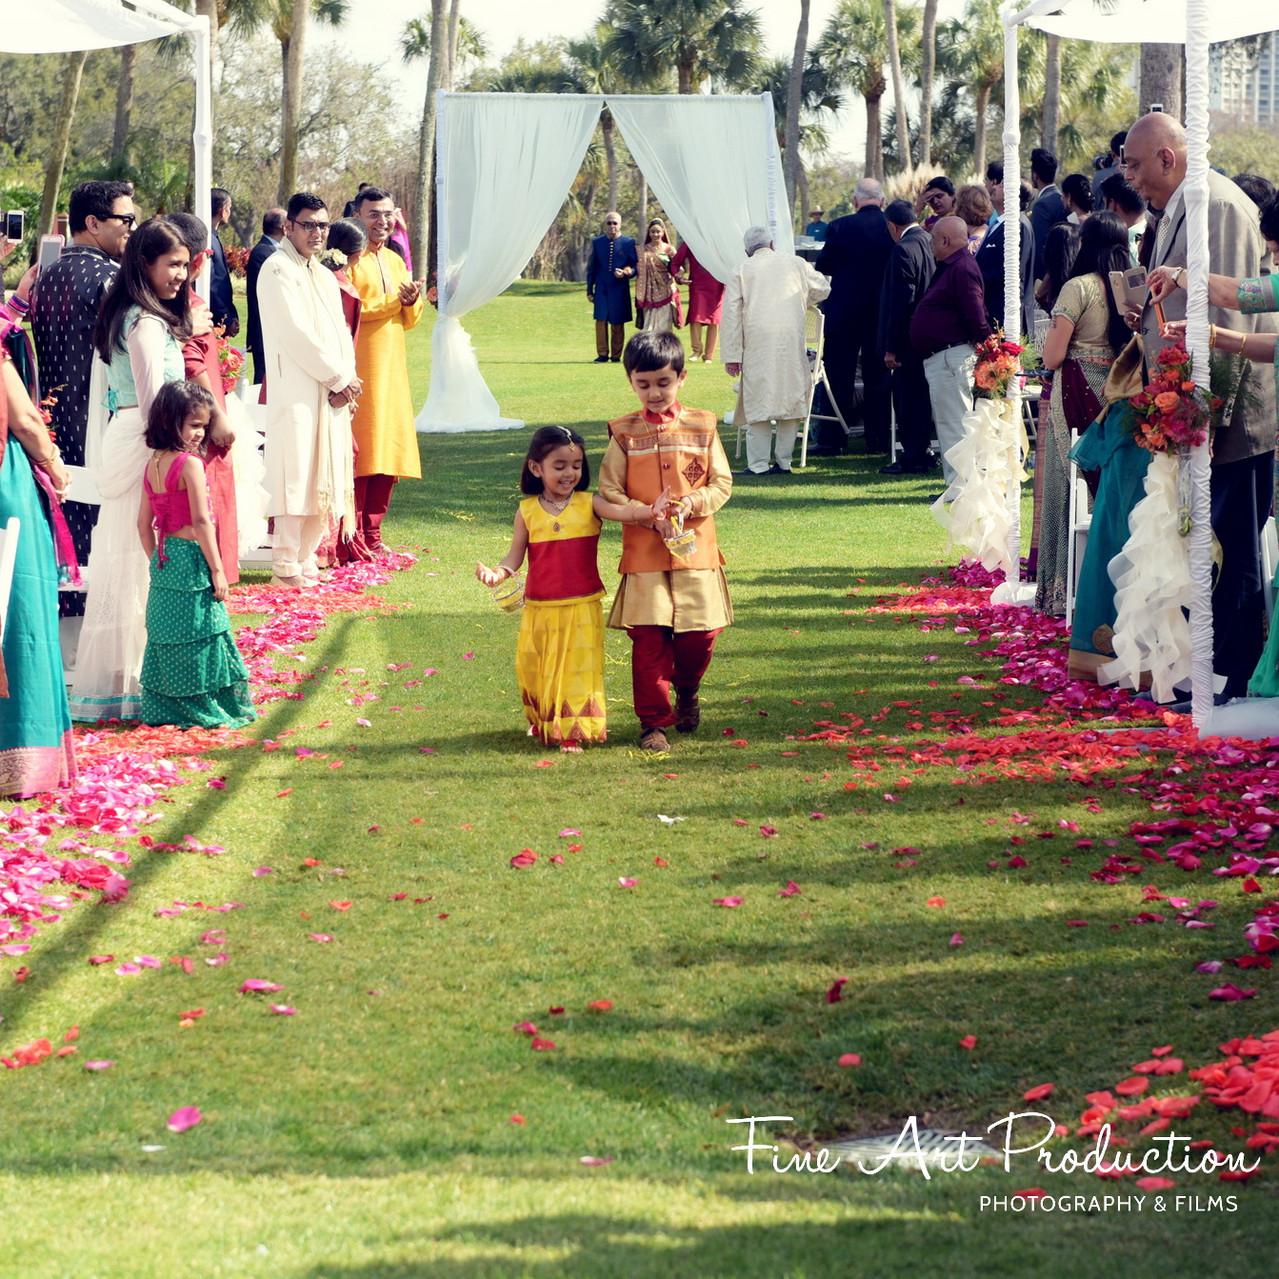 Hyatt-Regency-Grand-Cypress-Indian-Wedding-Photography-Fine-Art-Production-Amish-Thakkar_52